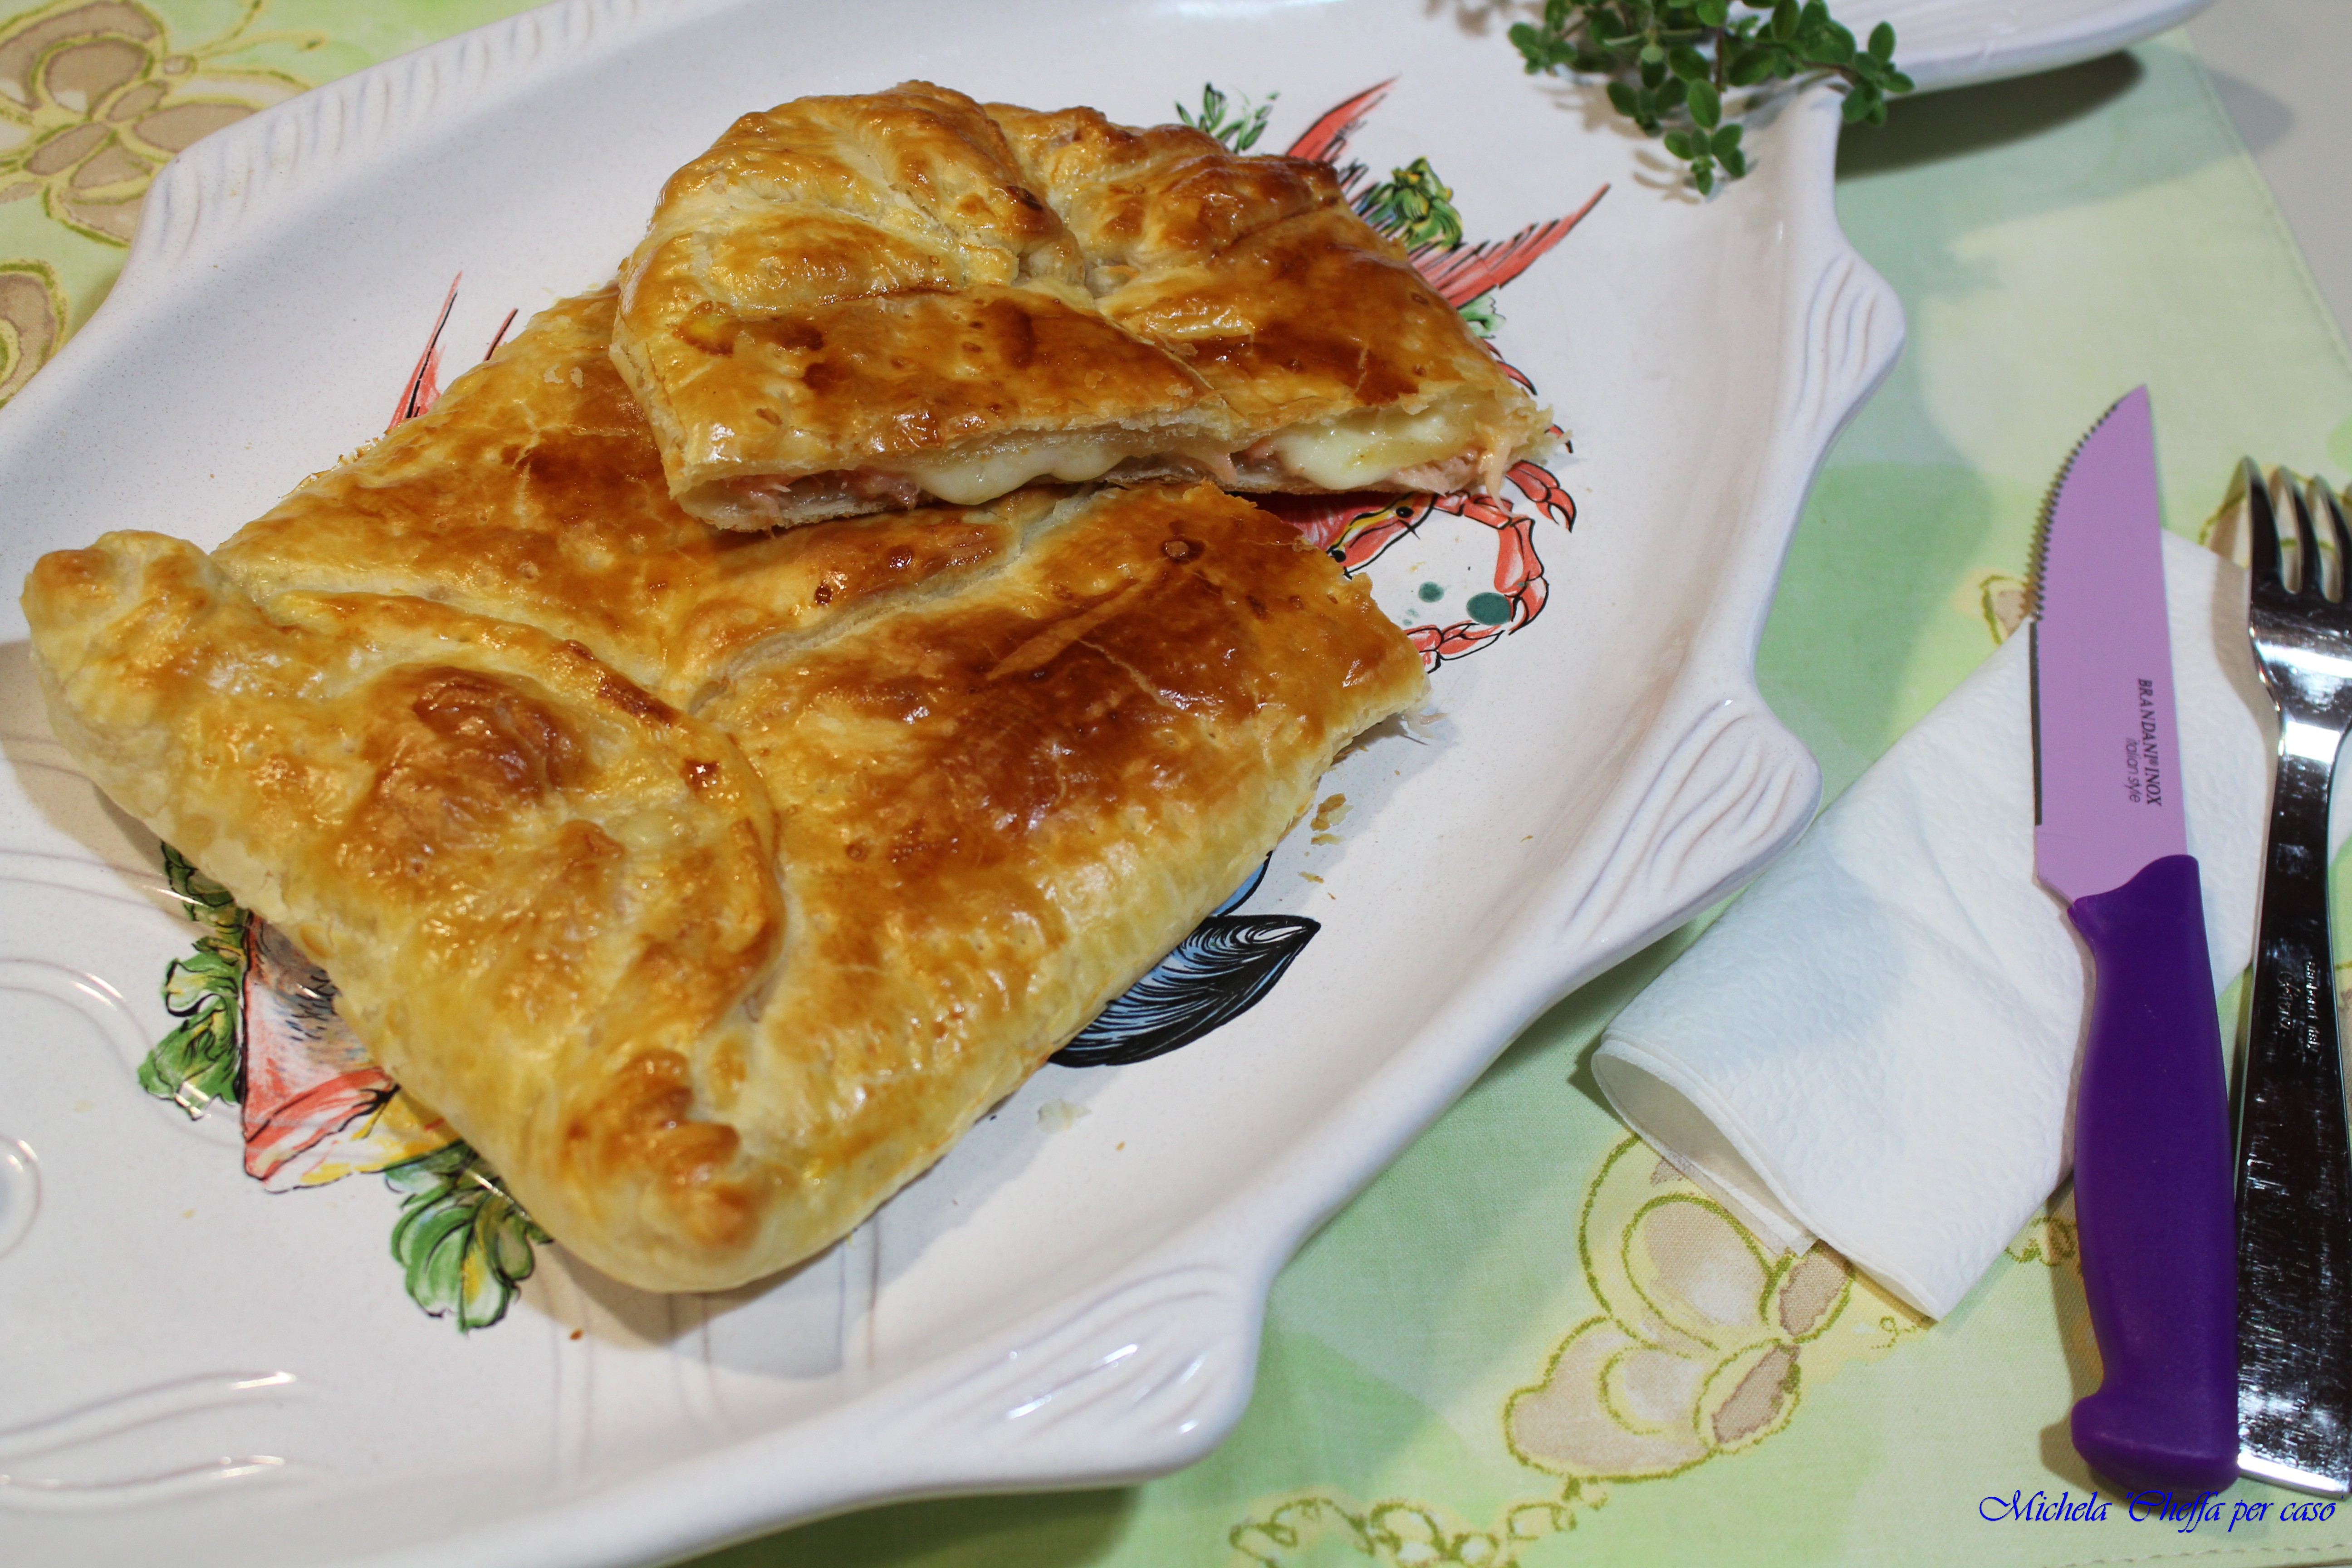 Salmone di suocera! Torta salata al salmone affumicato